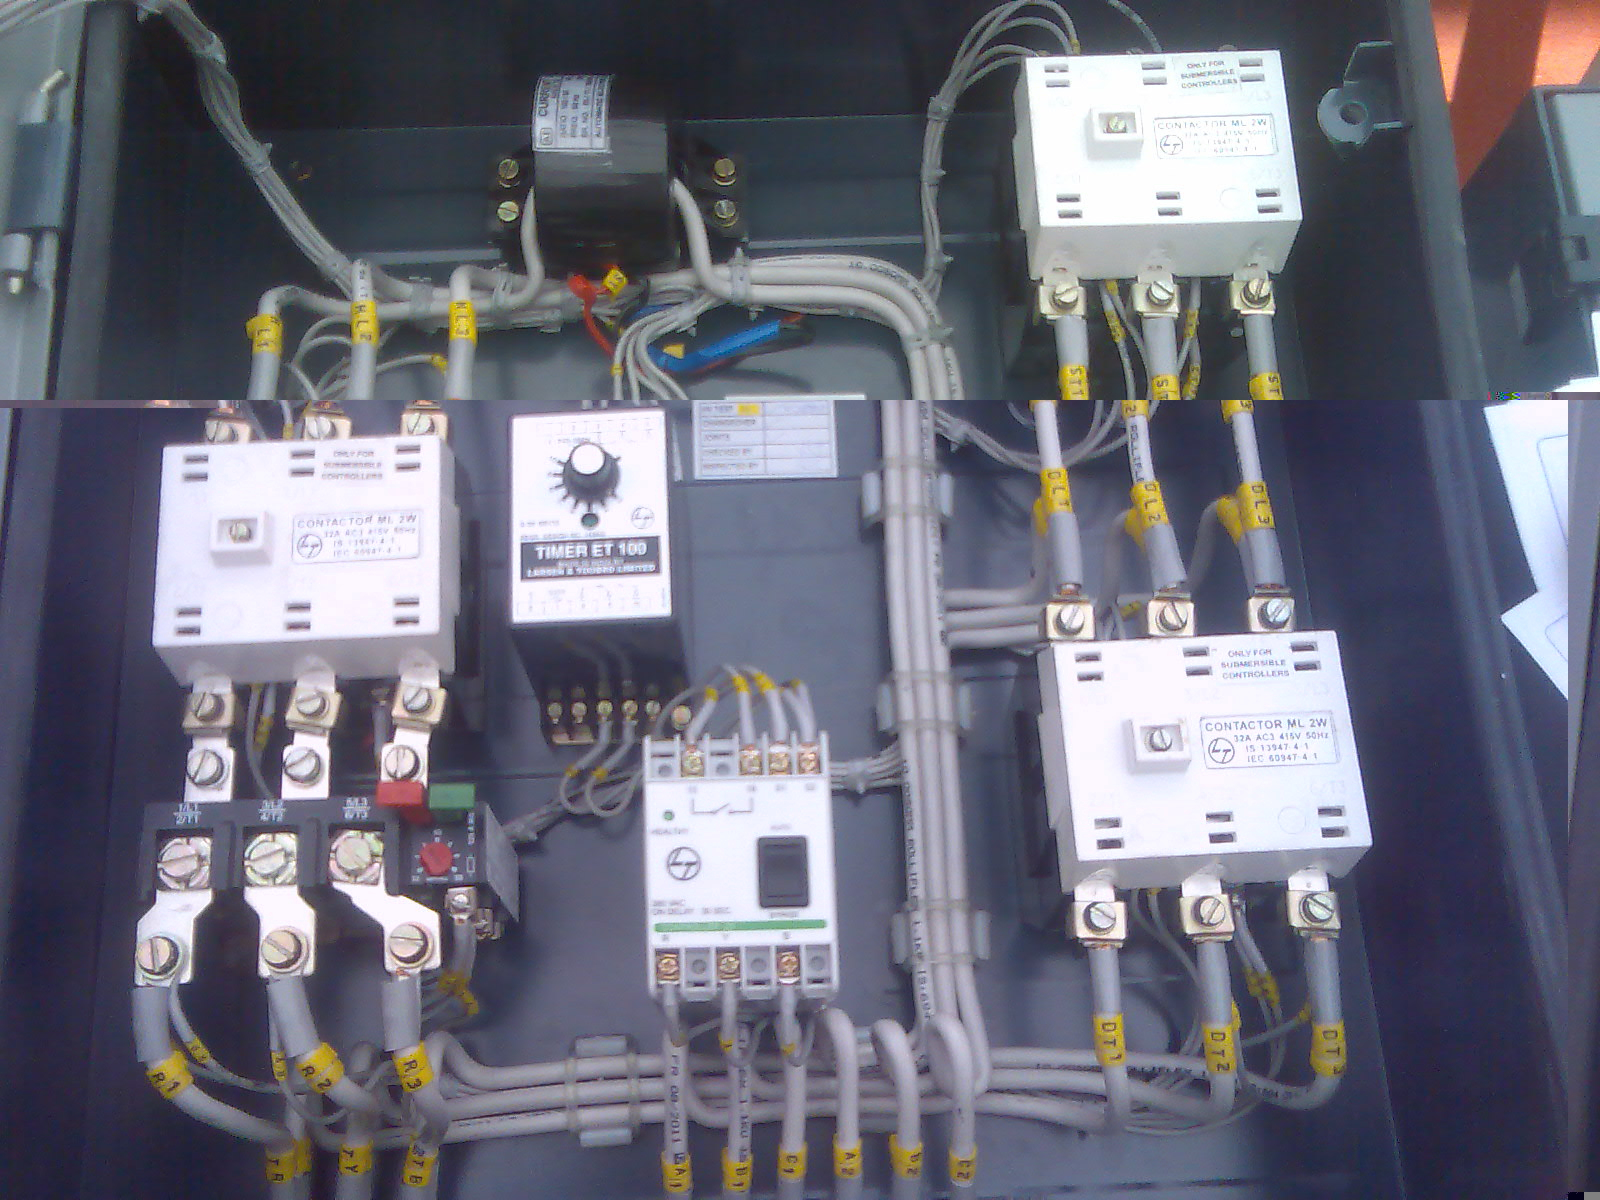 Dol Panel Diagram | Wiring Library - Square D Motor Starter Wiring Diagram